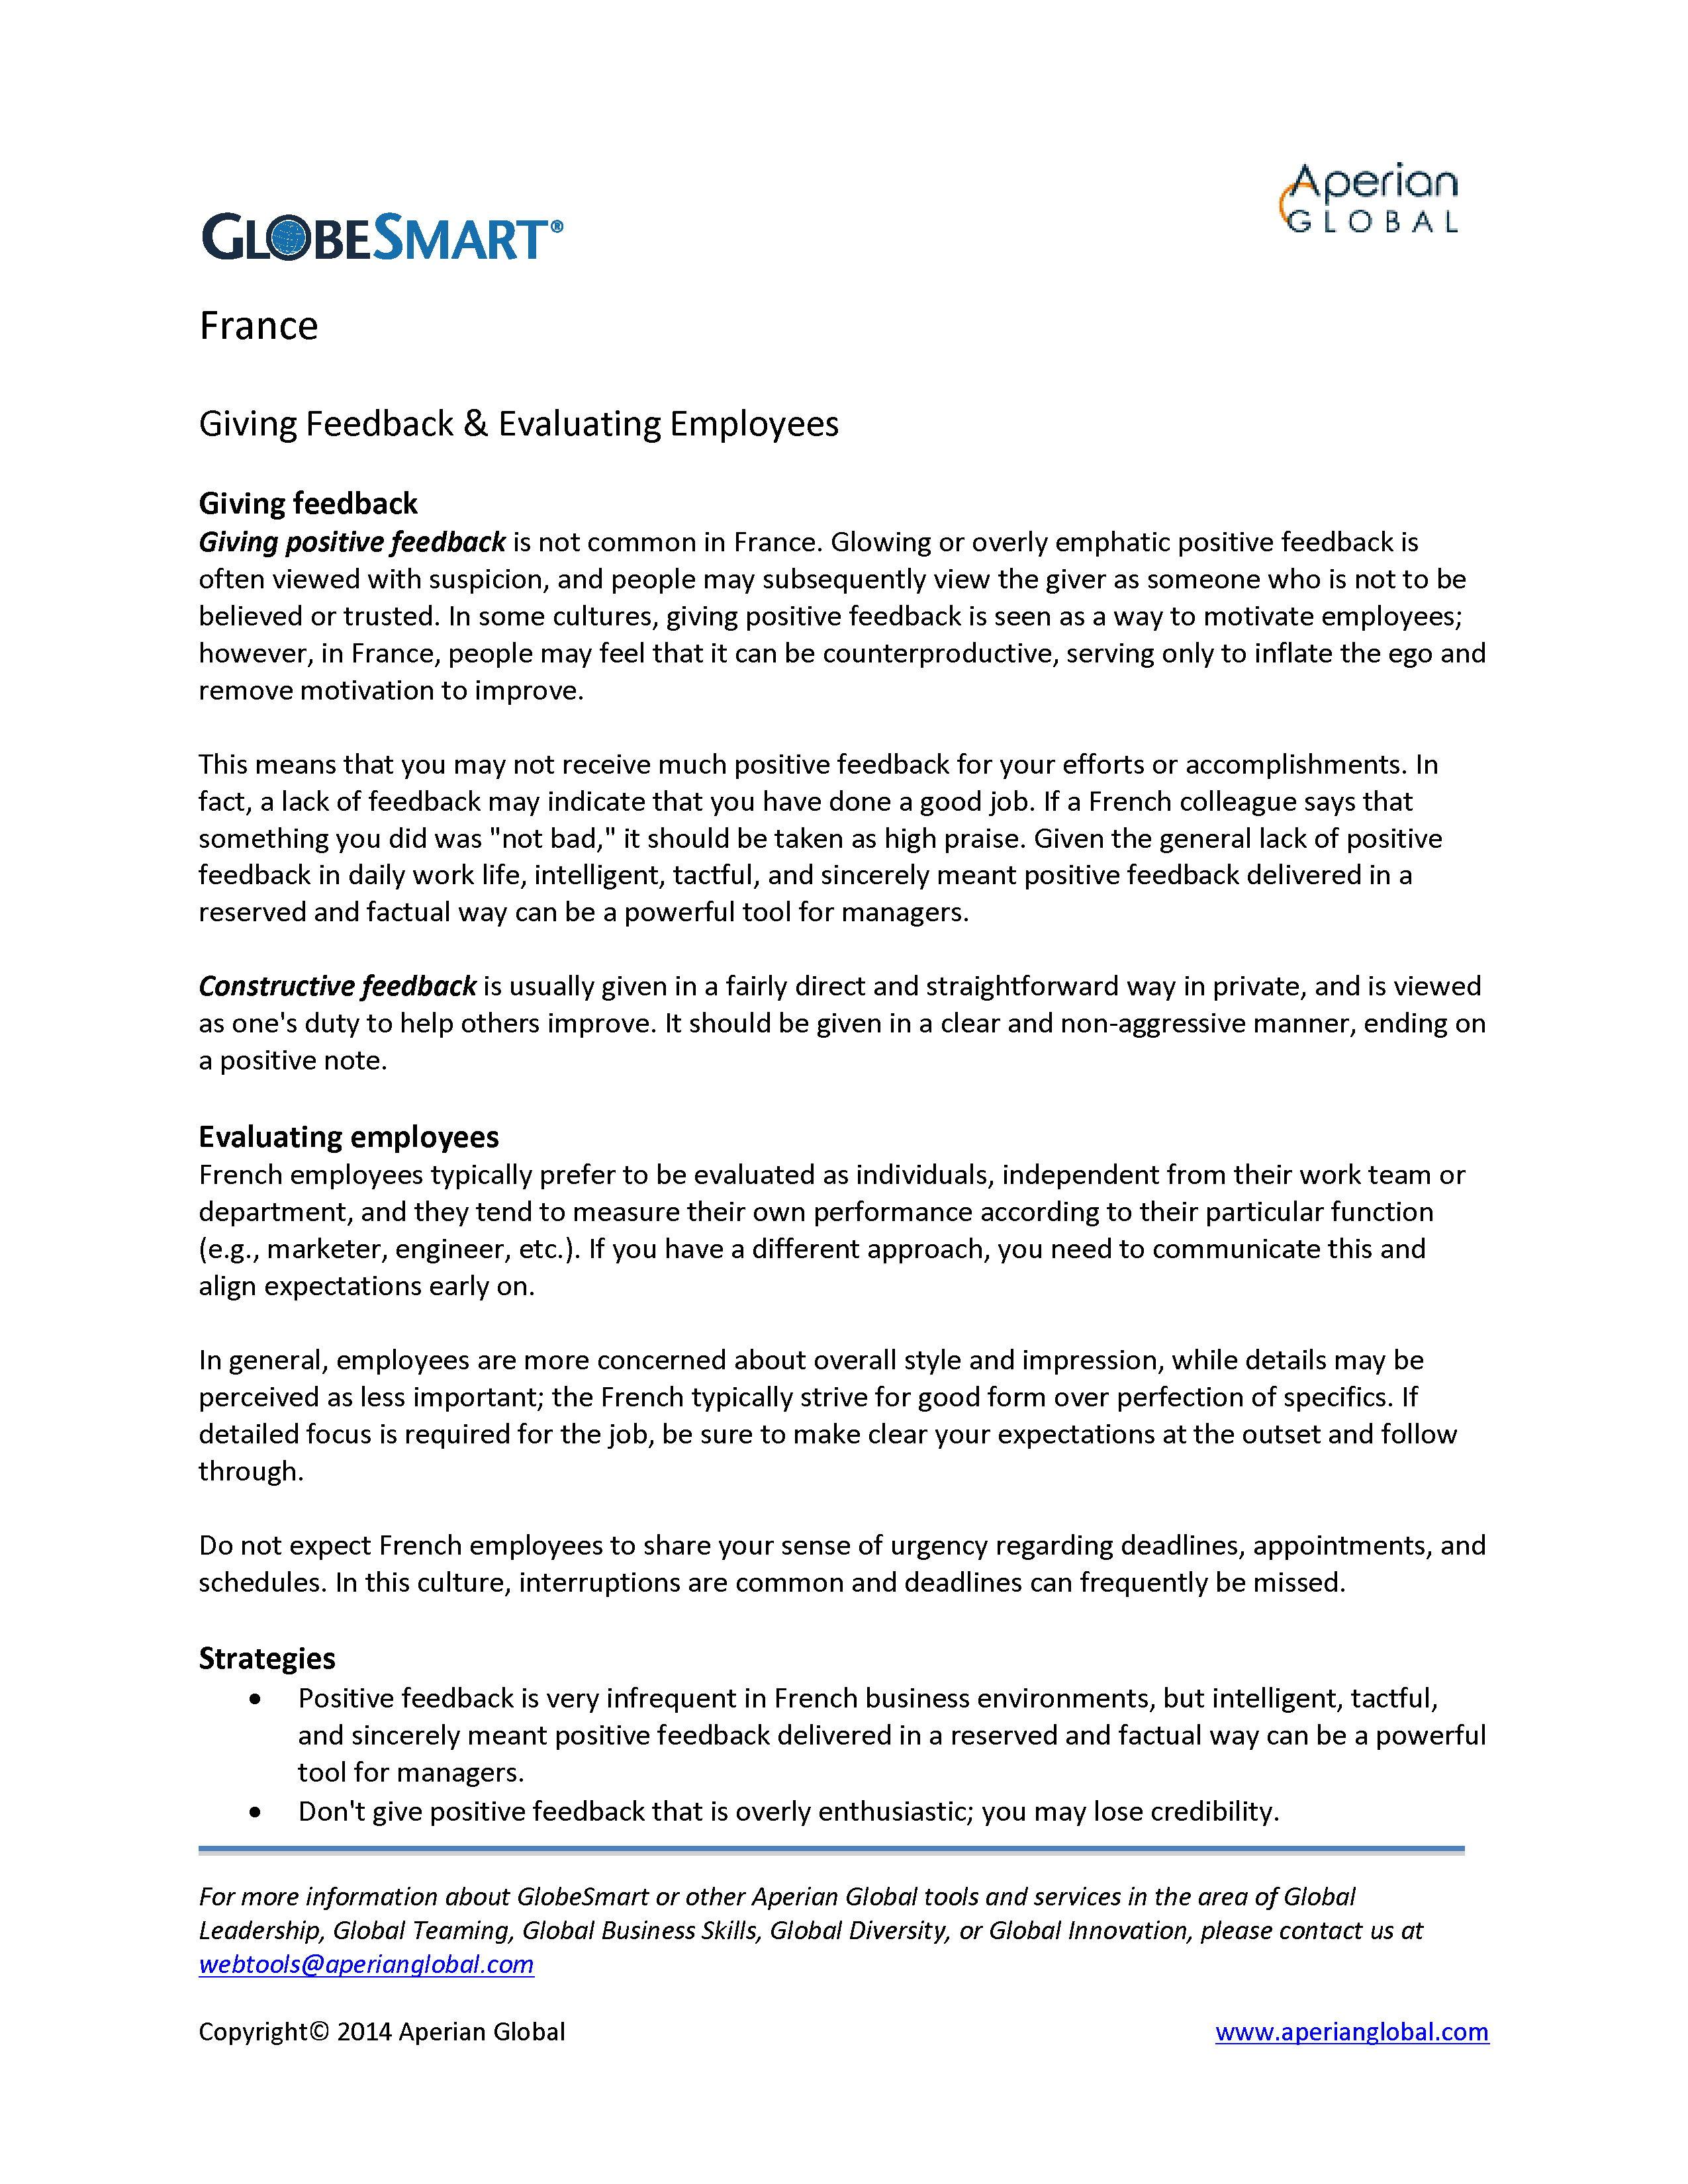 France: Giving Feedback & Evaluating Employees | Alexander